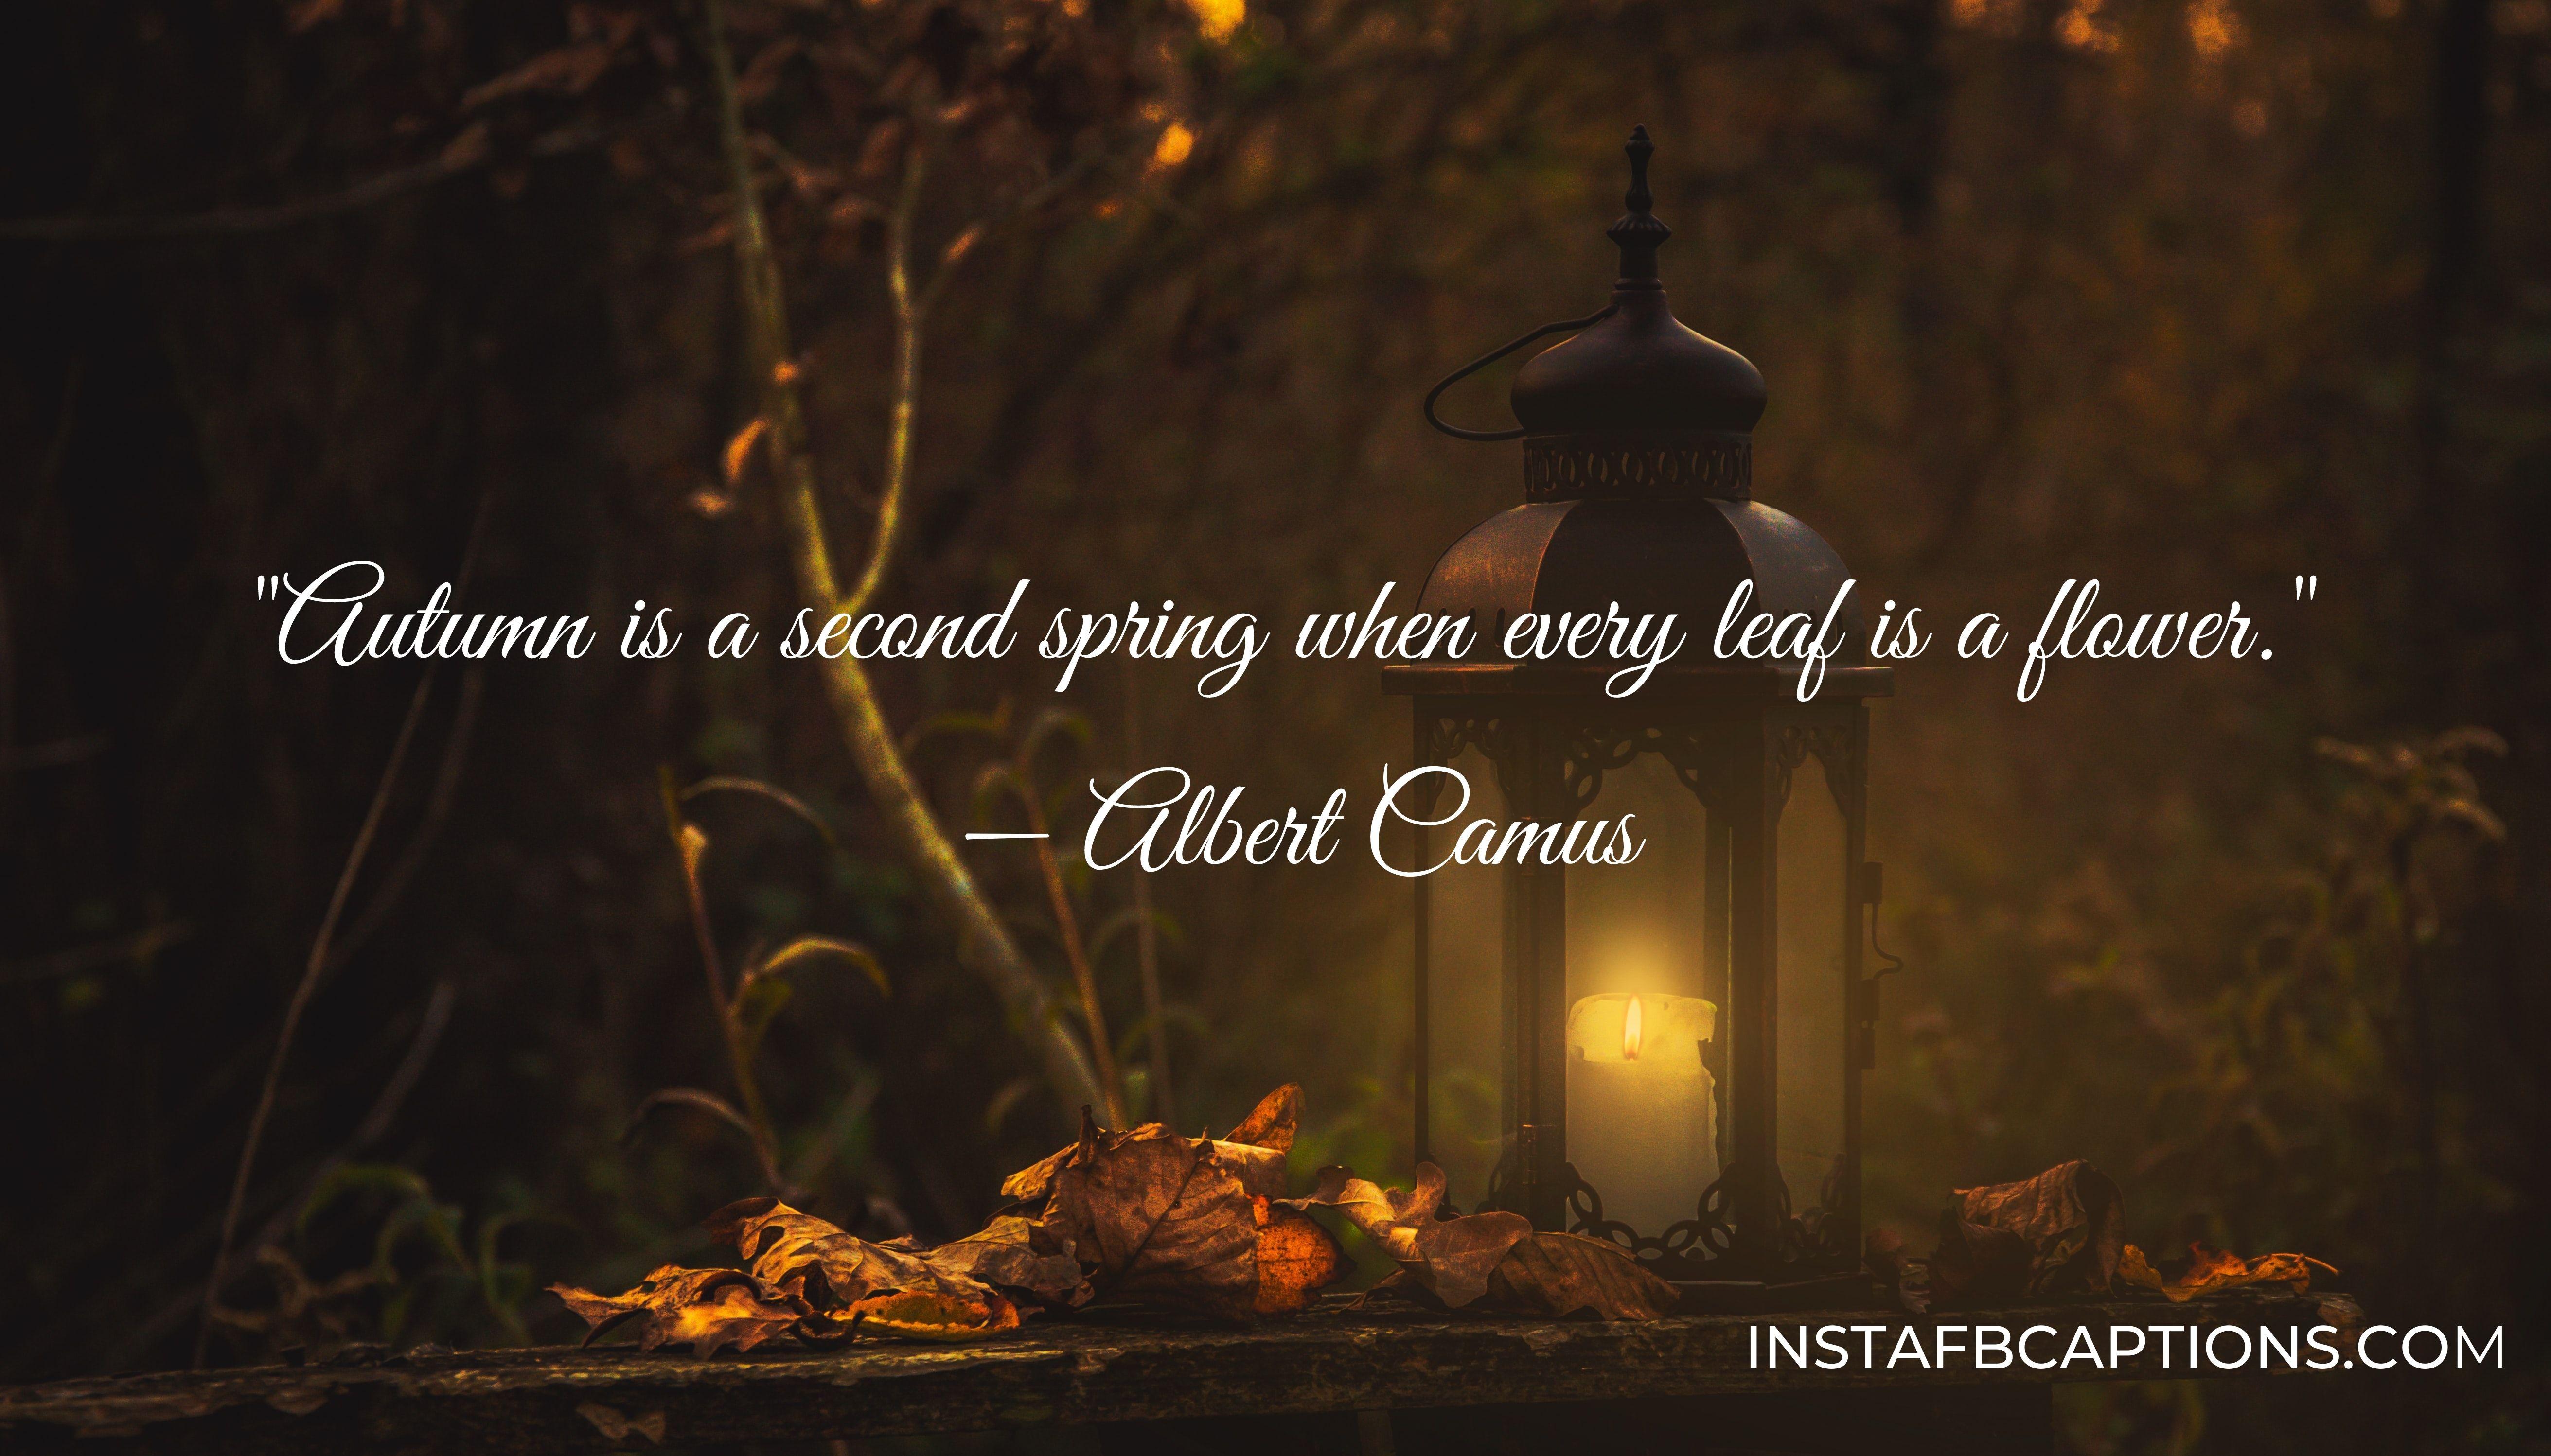 Autumn Inspirational Captions  - Autumn Inspirational Captions - 120+ FALL Instagram Captions for AUTUMN 2021